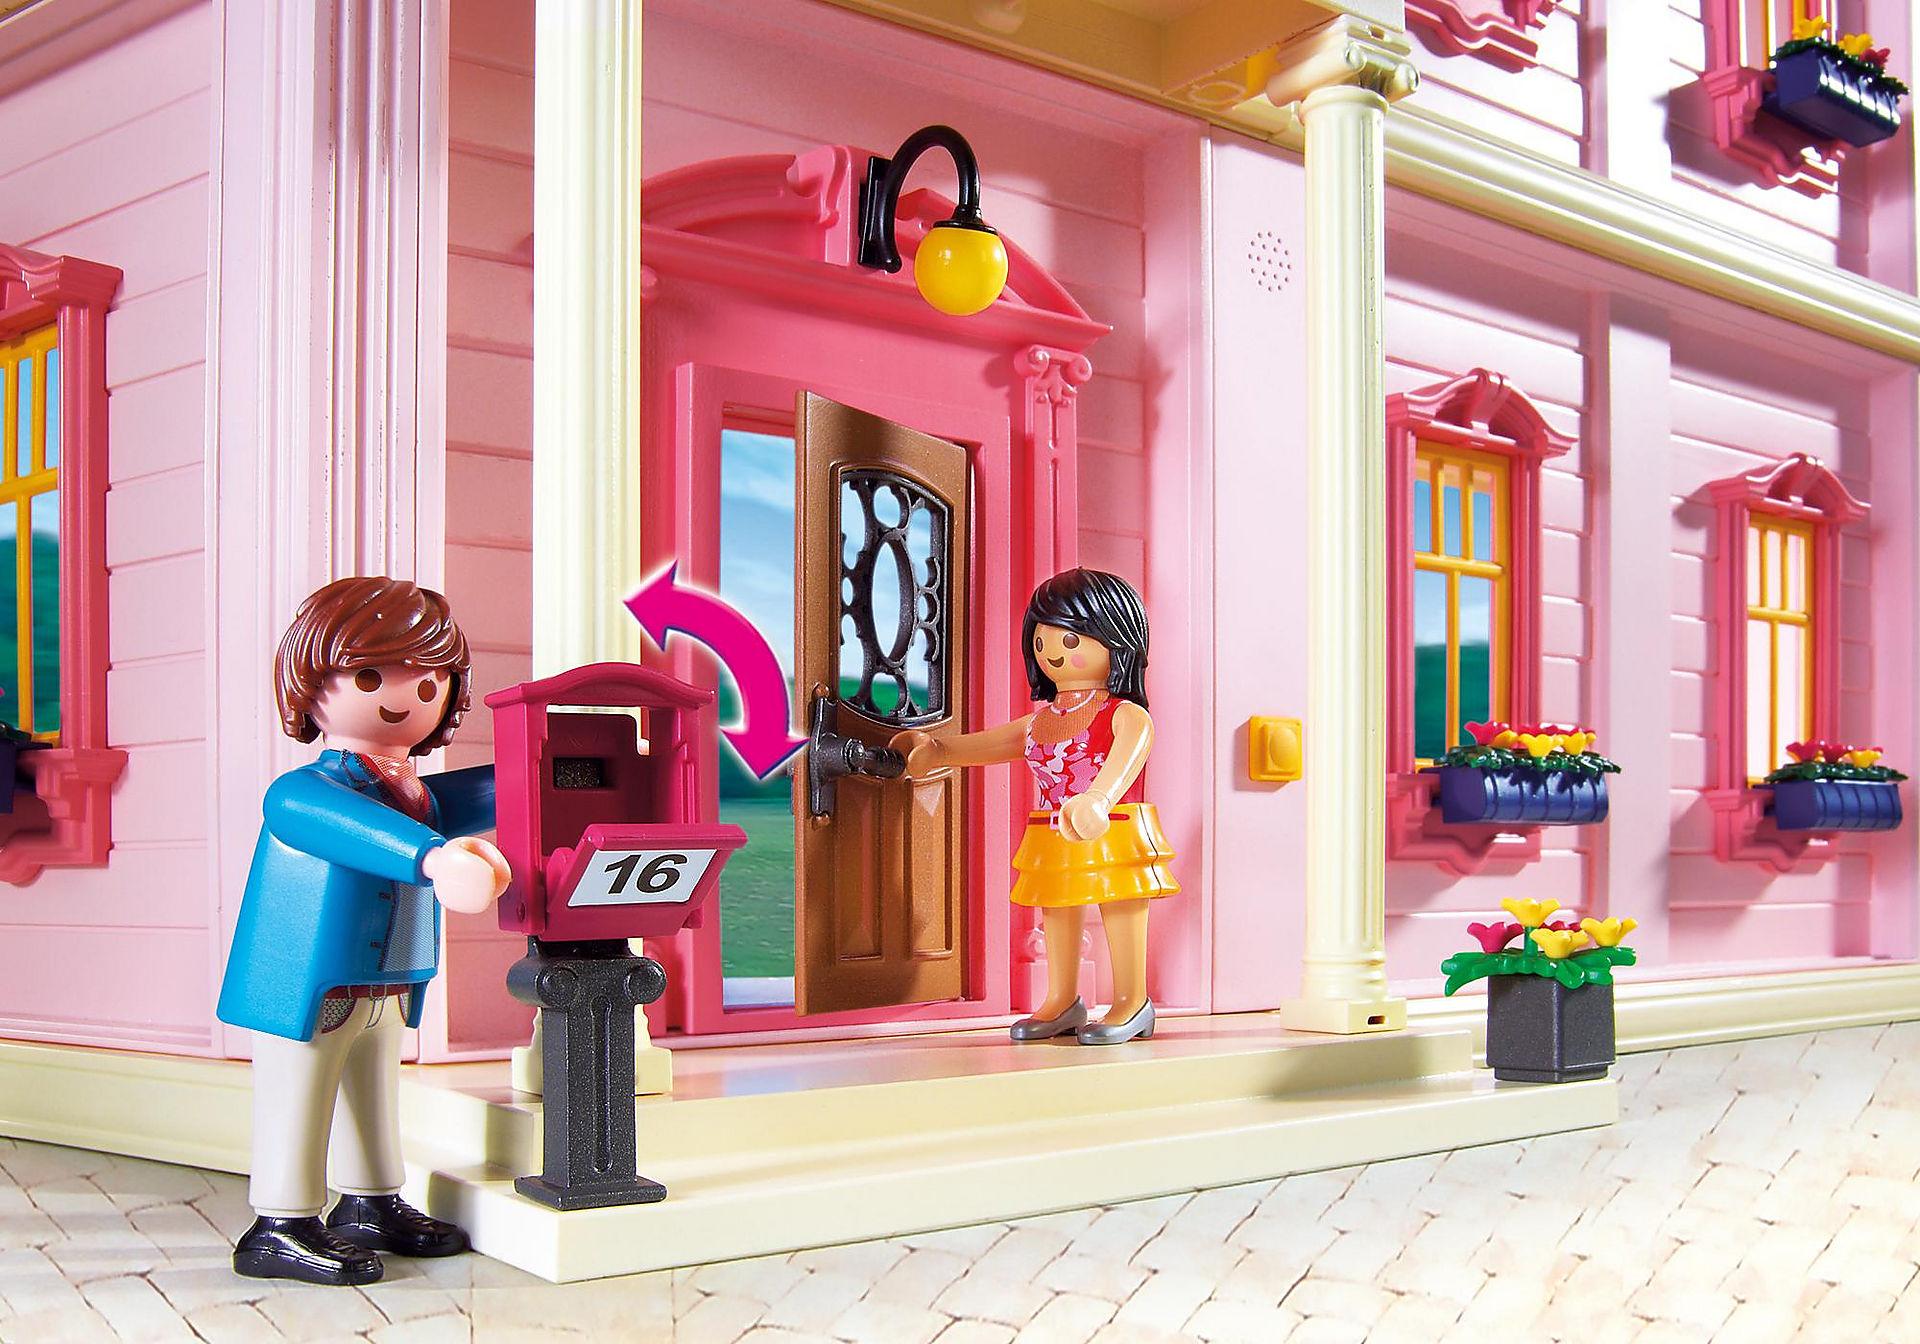 http://media.playmobil.com/i/playmobil/5303_product_extra1/Romantisches Puppenhaus